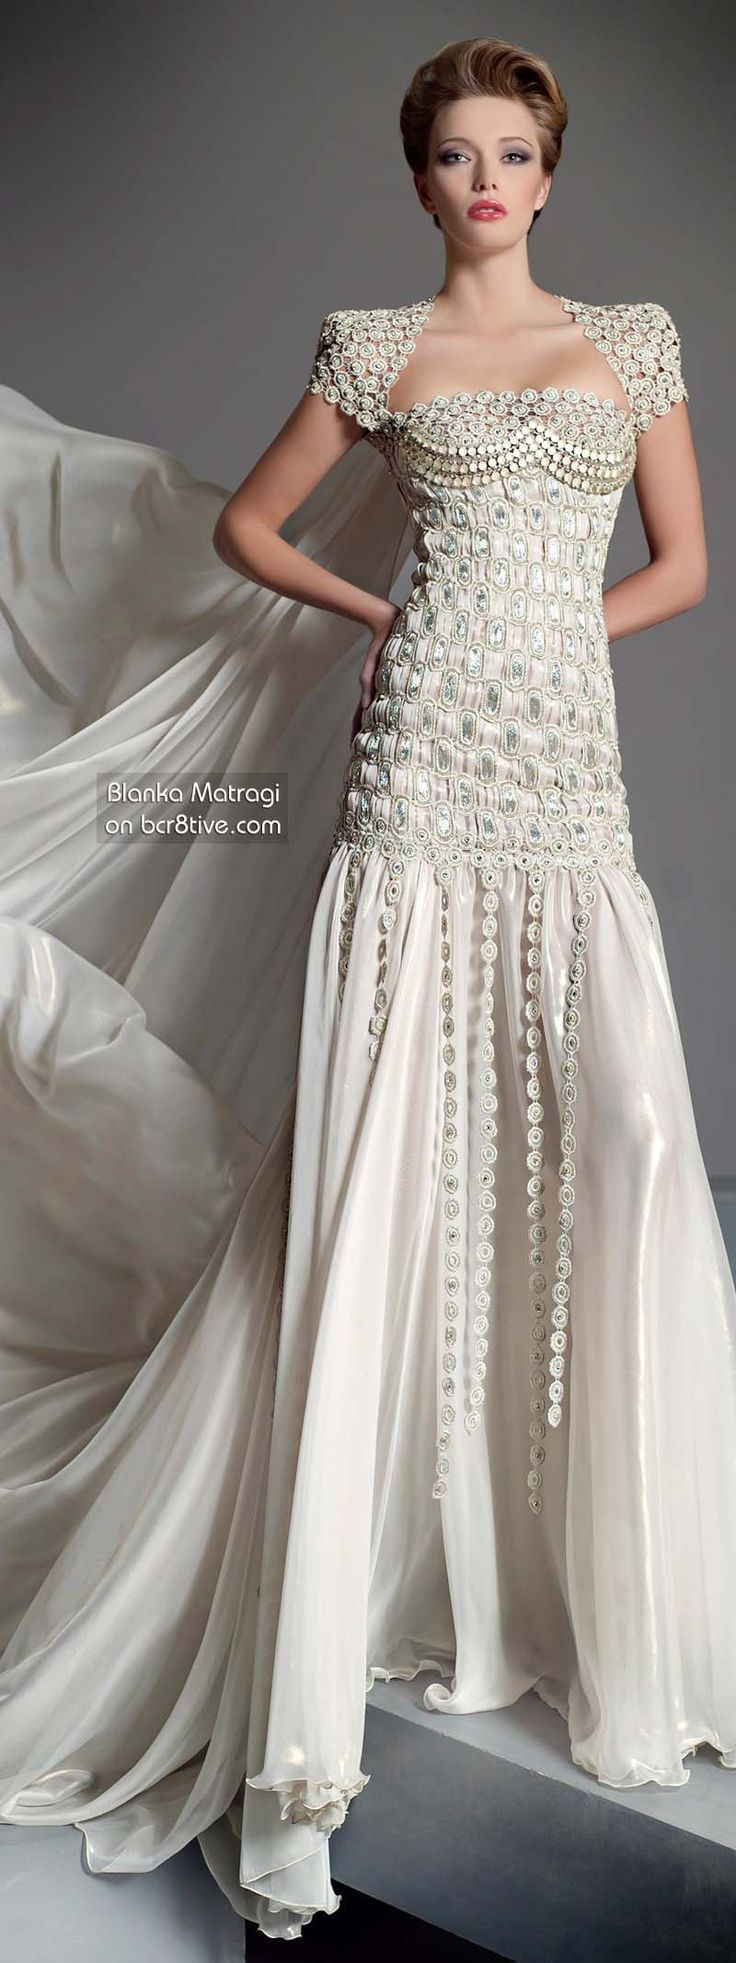 Blanka Matragi 30th Anniversary Couture Collection on bcr8tive.com - Wedding Dress